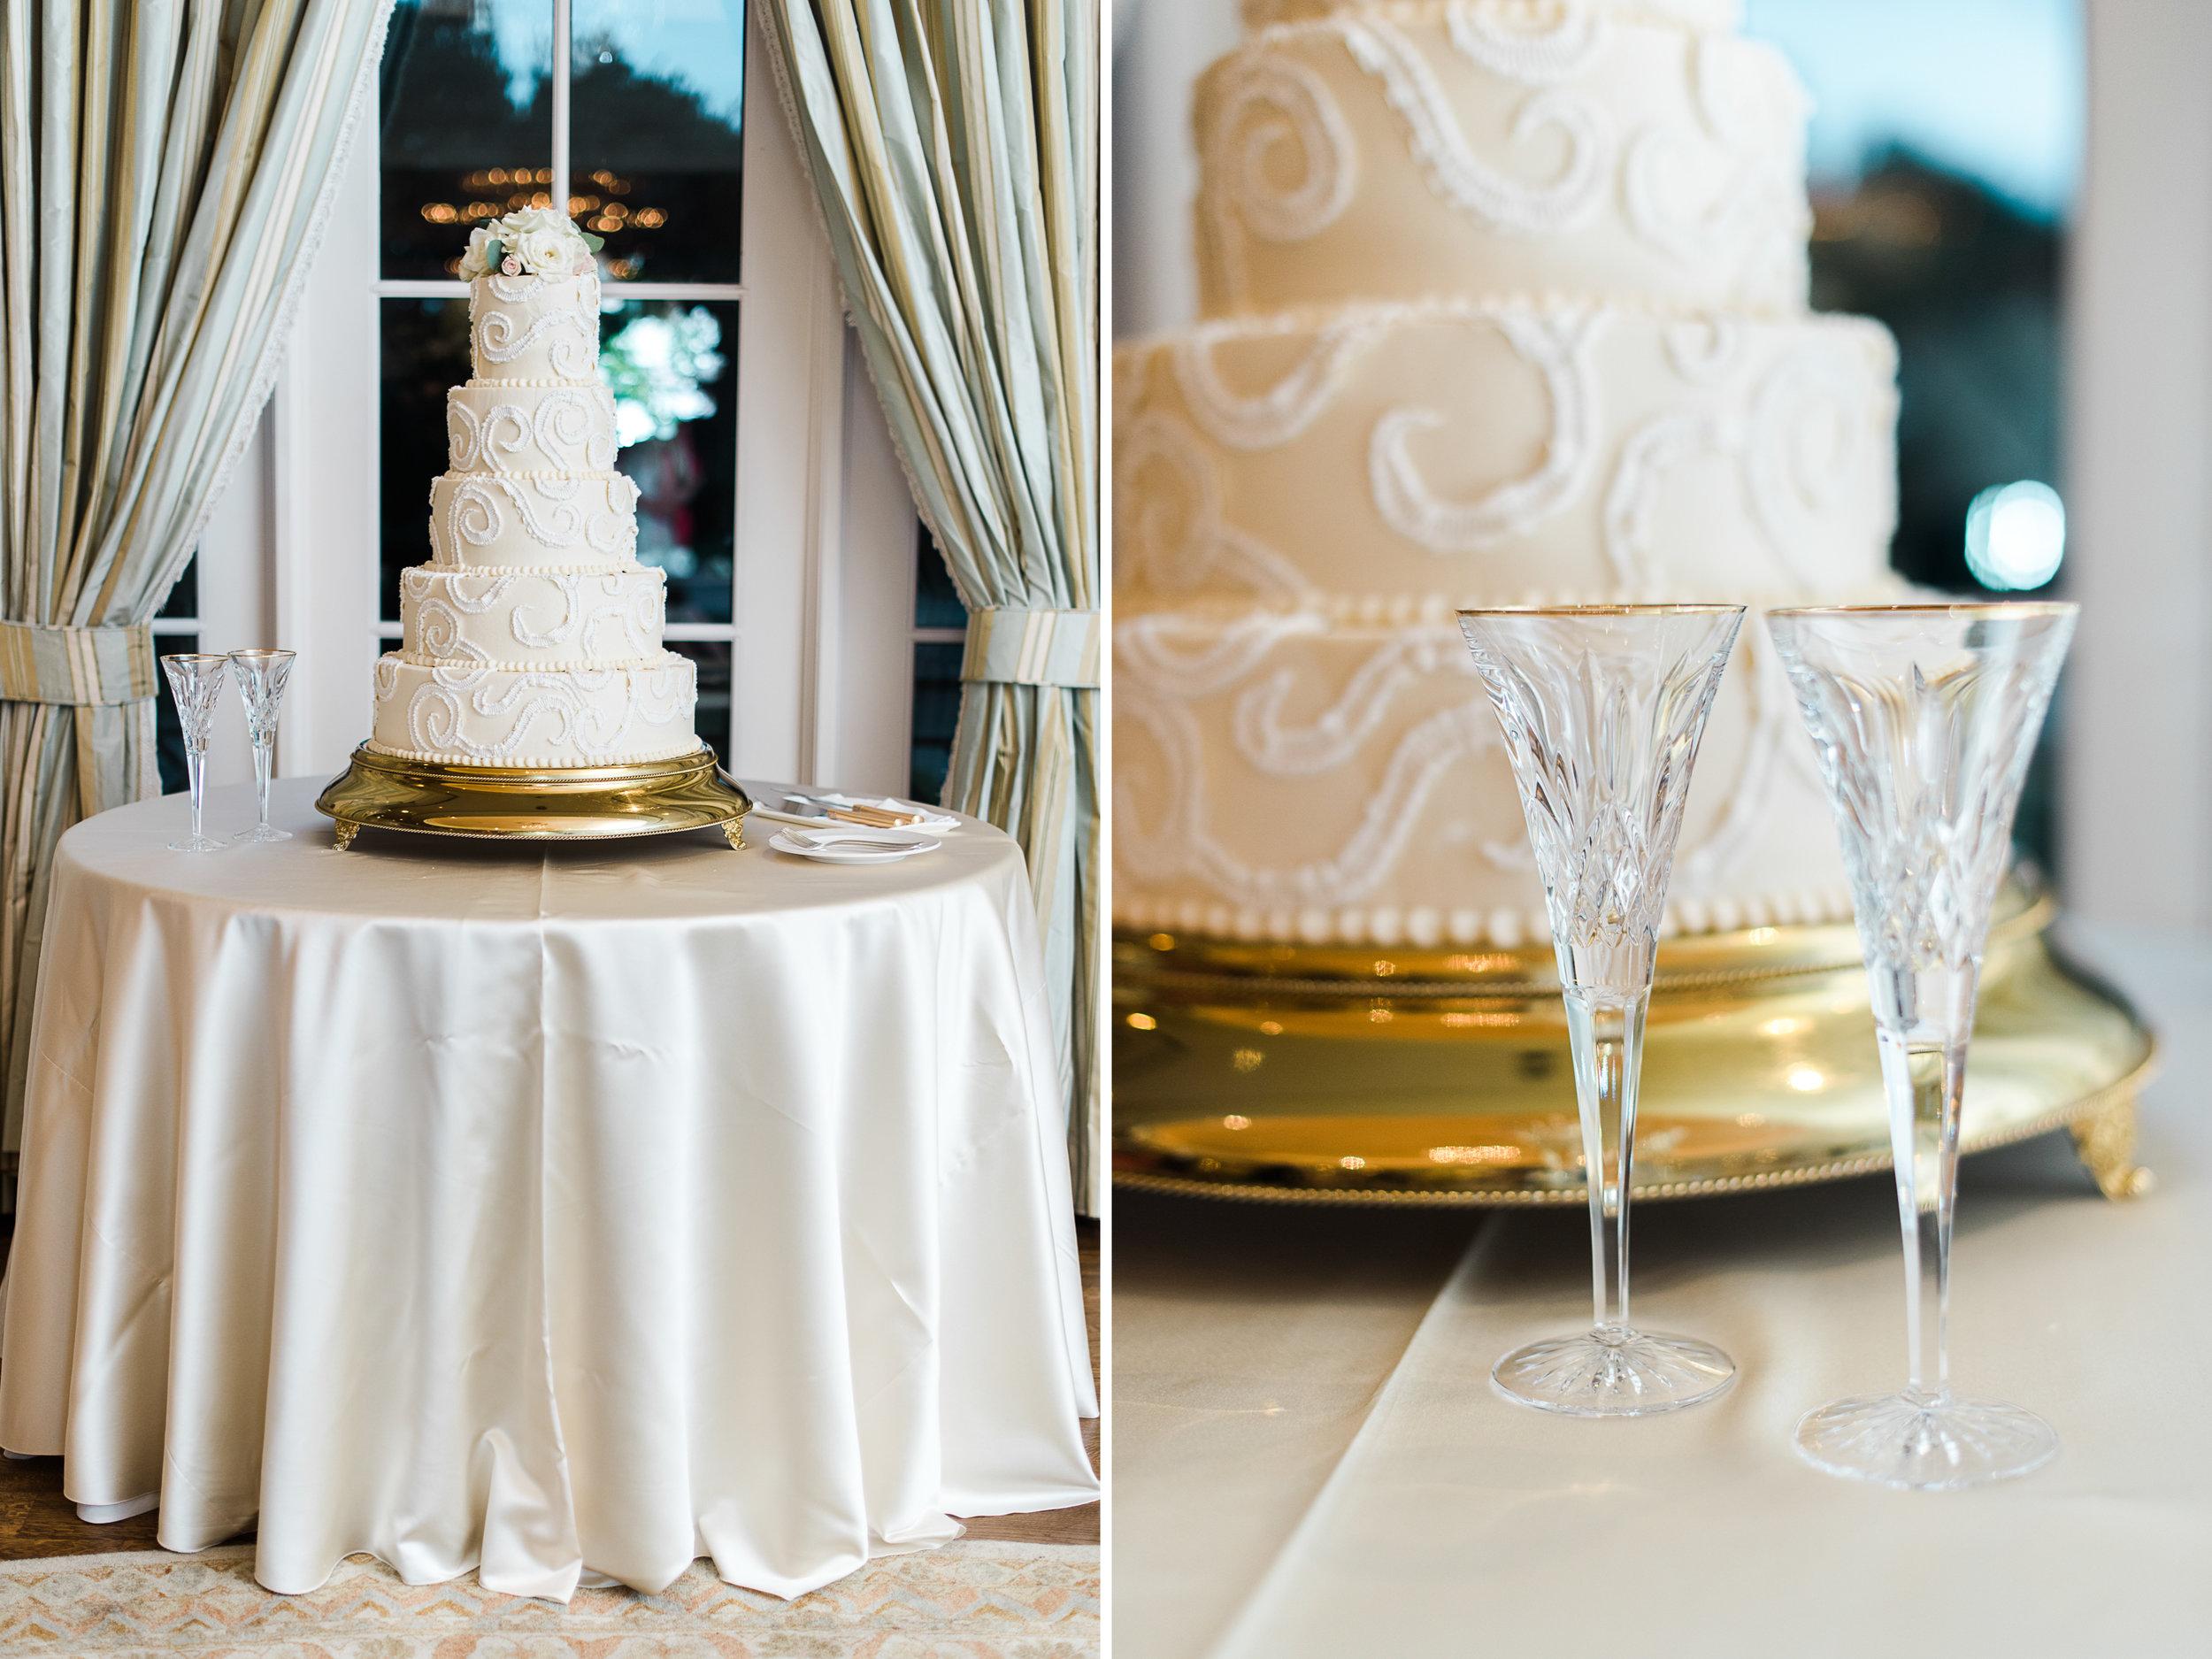 Fine-Art-Film-Houston-Wedding-Photographer-Best-Top-Luxury-Texas-Austin-Dallas-Destination-Dana-Fernandez-Photography-River-Oaks-Country-Club-South-Main-Baptist-Ceremony-Reception-Wedding-121.jpg